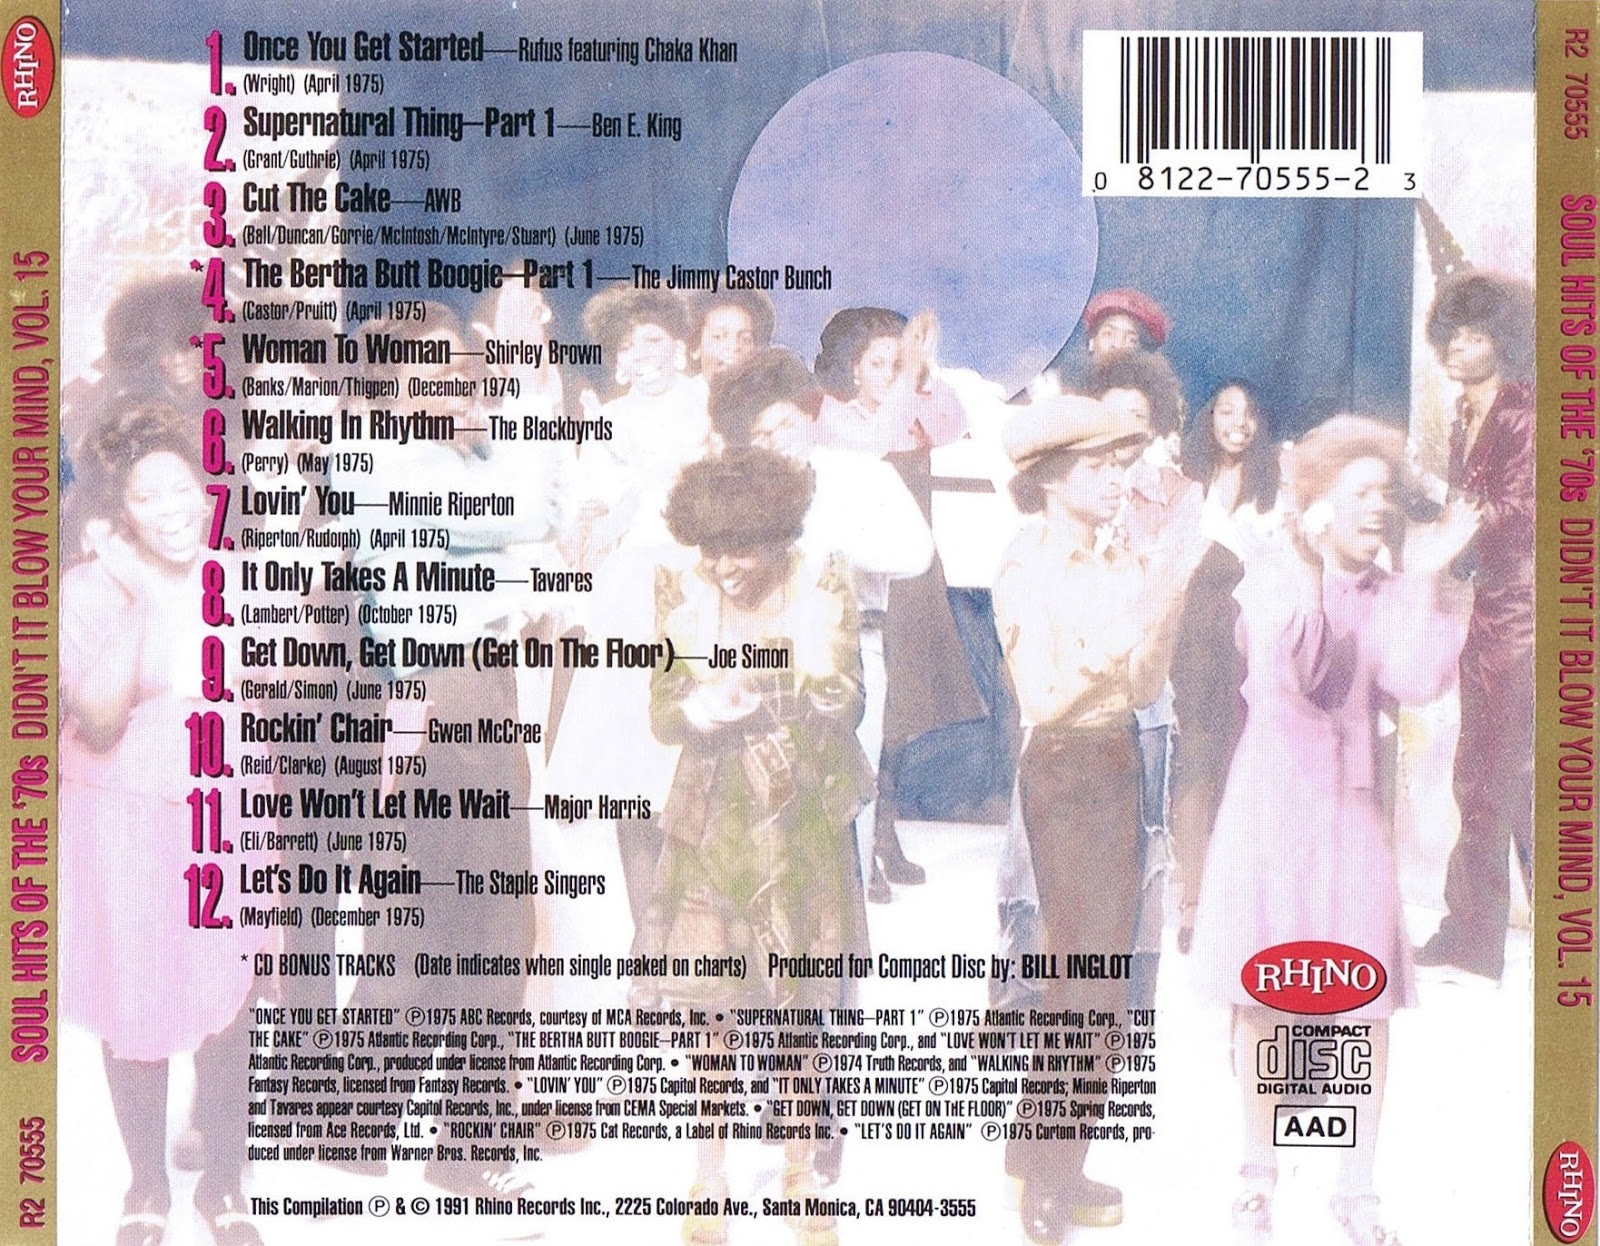 Soul Hits Of The 70s: O Som Dos Prado's: Soul Hits Of The